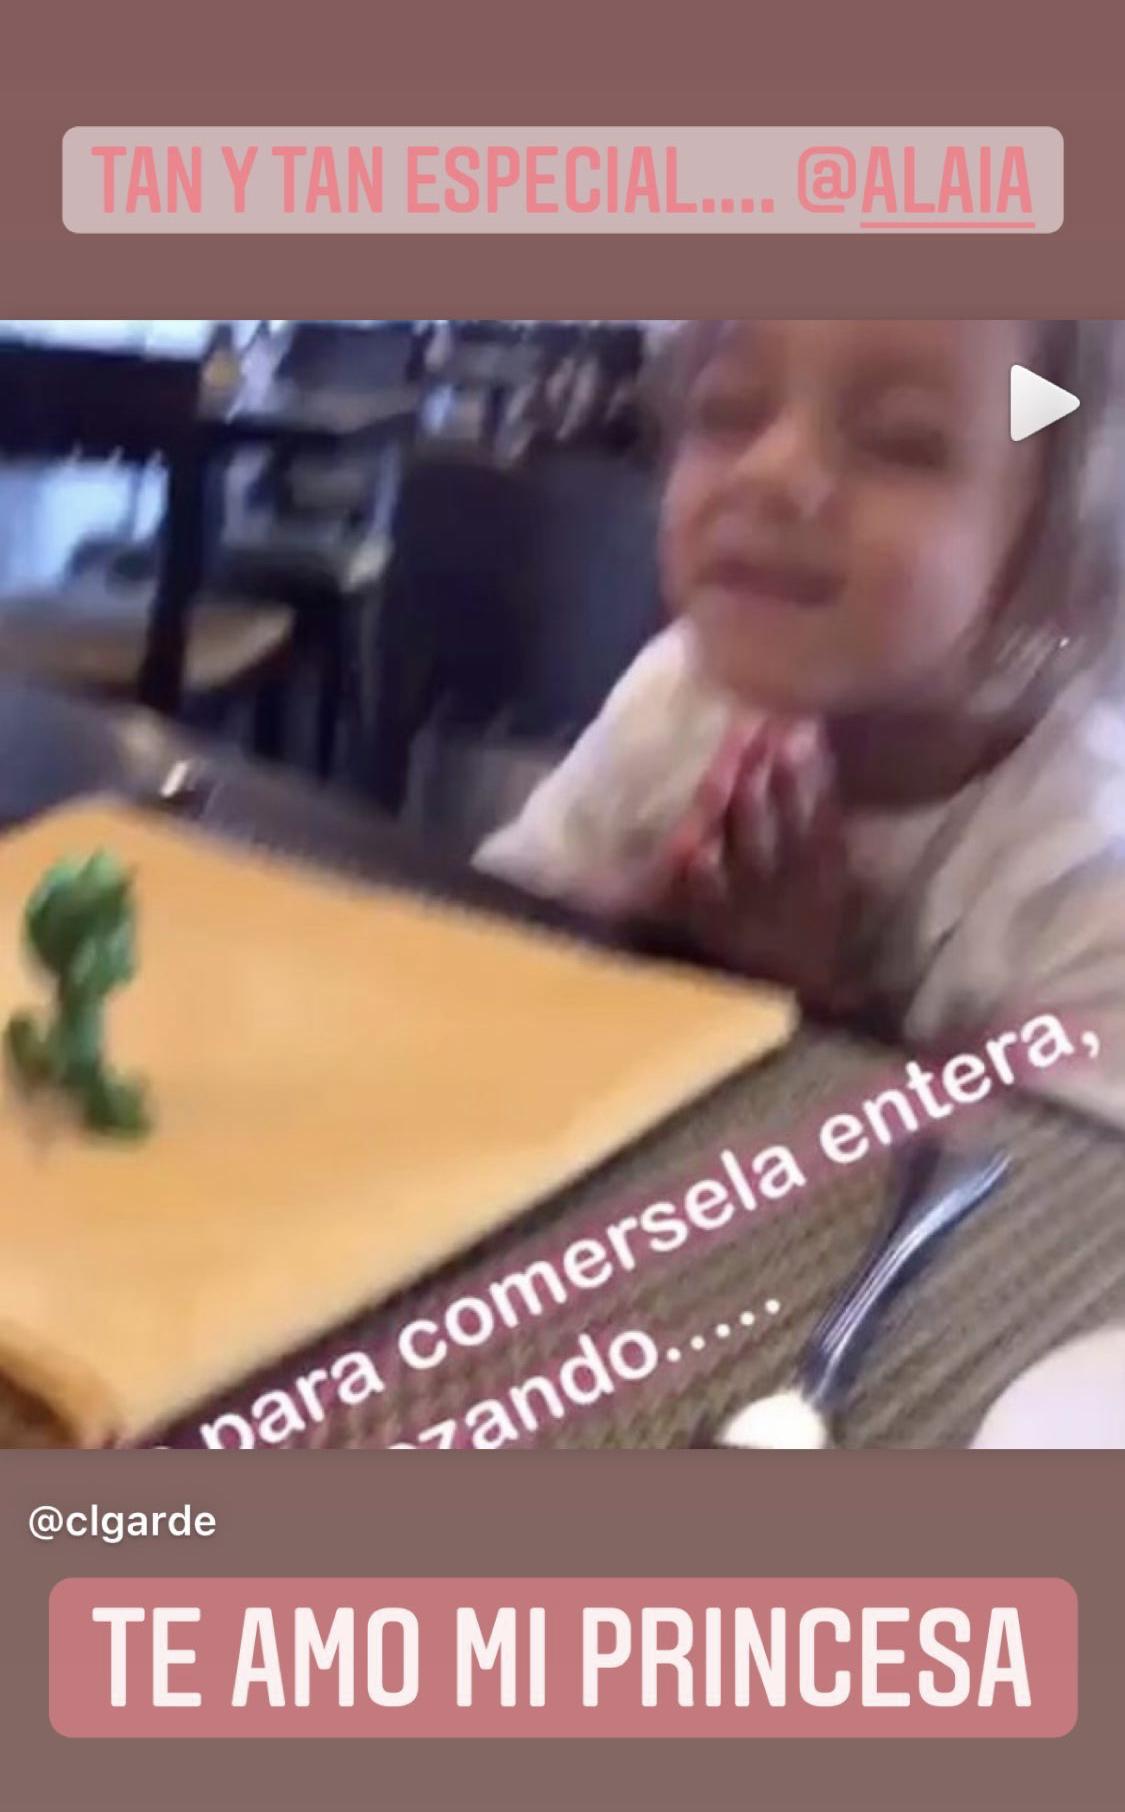 Alaïa Toni Costa